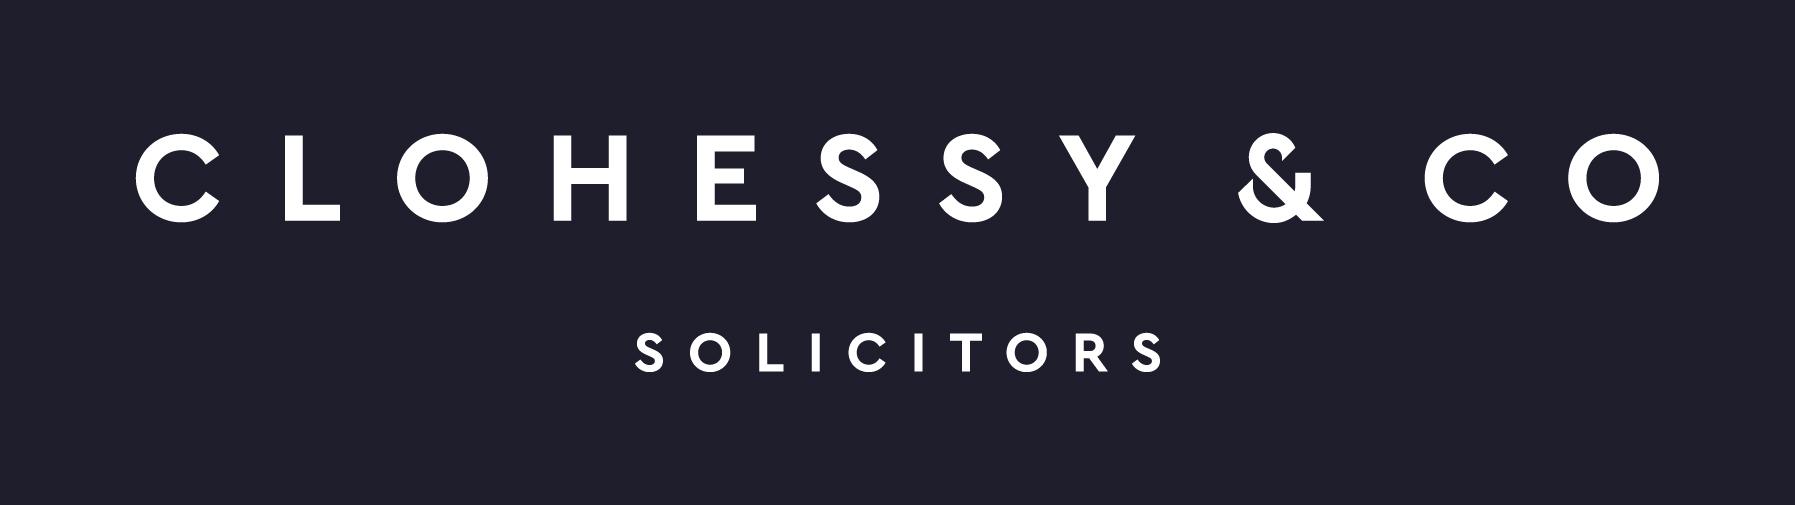 Clohessy & Co Solicitors logo